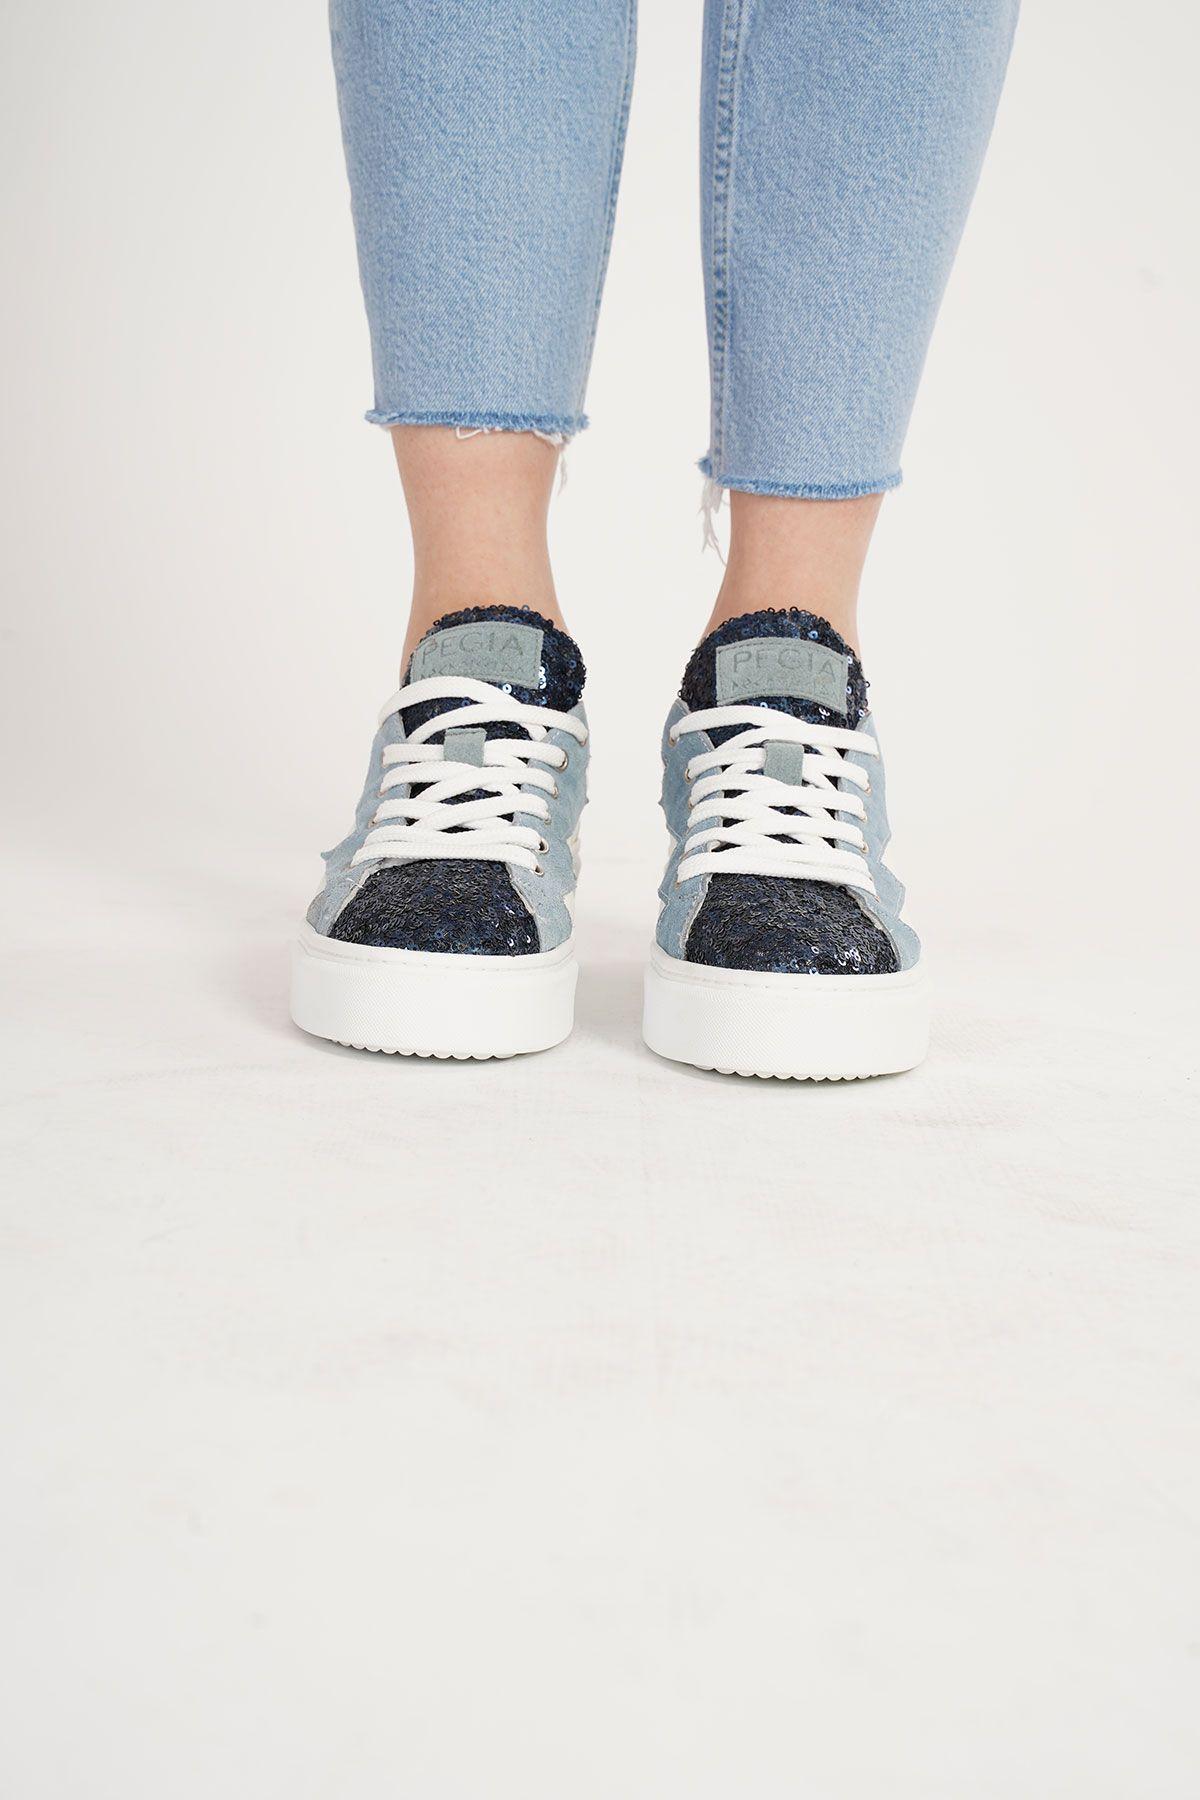 Pegia Genuine Leather Sequined Women's Sneaker LA1501 Turquoise